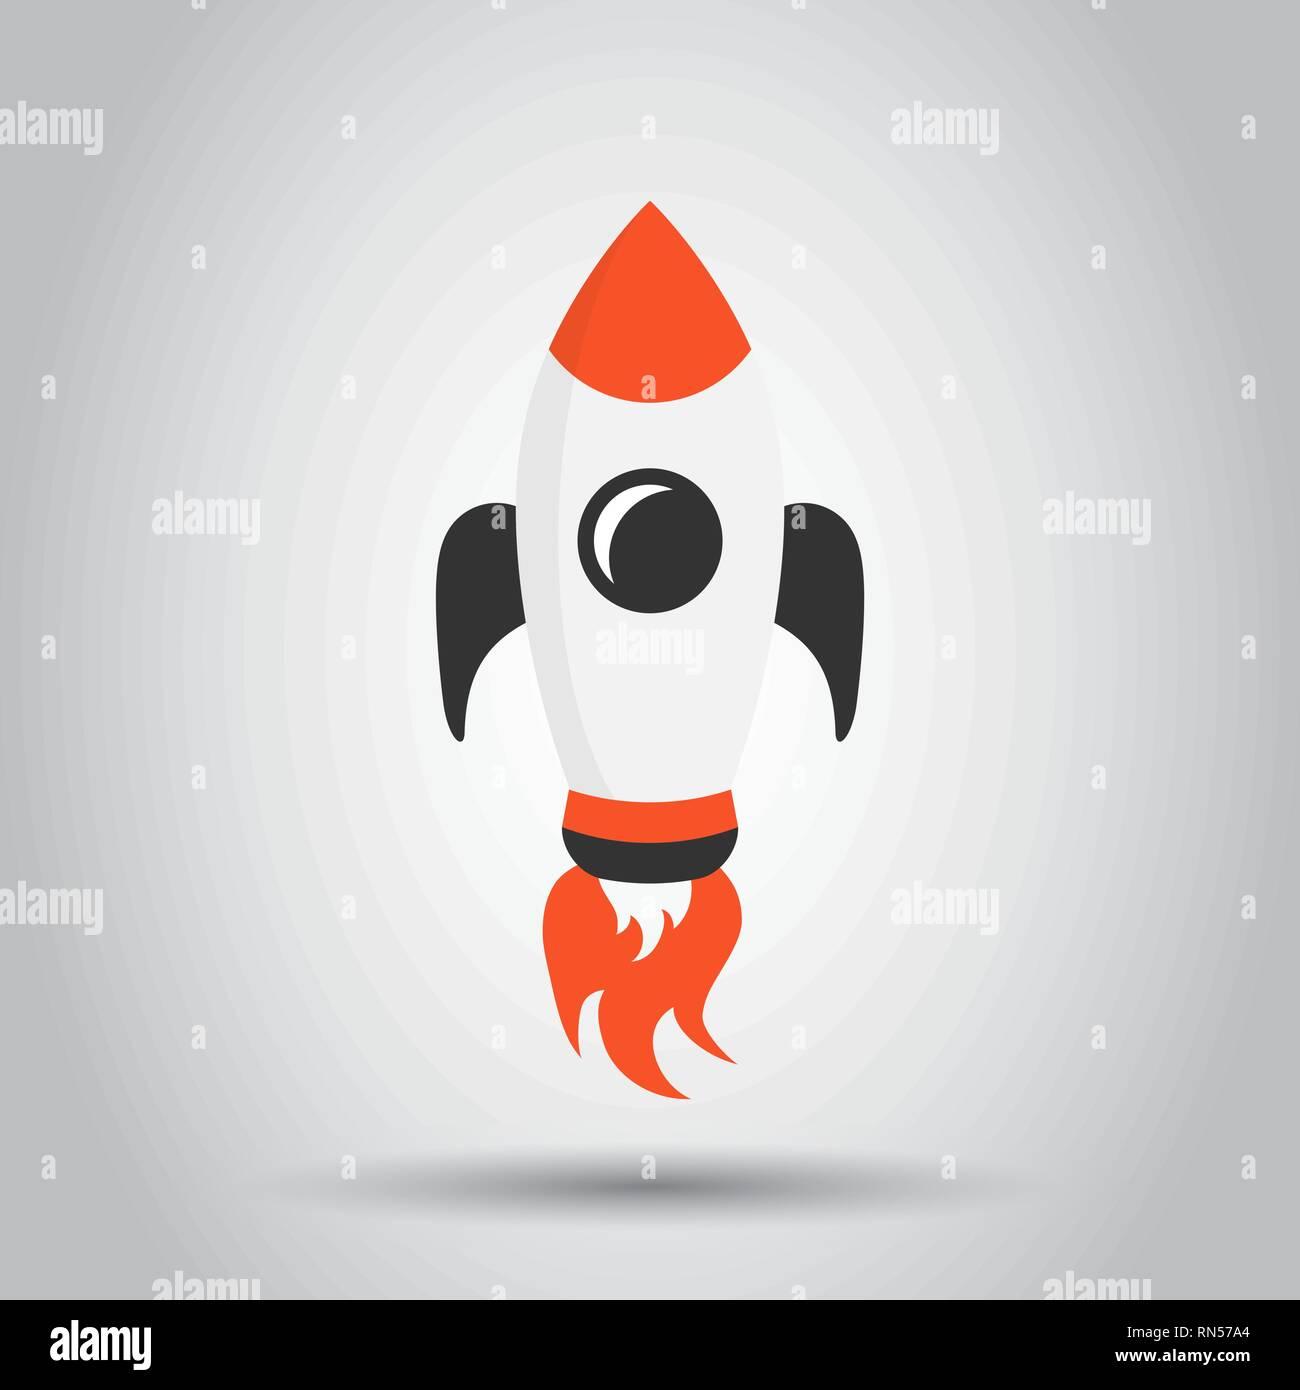 Space Cartoon Animated Spaceship Rockets